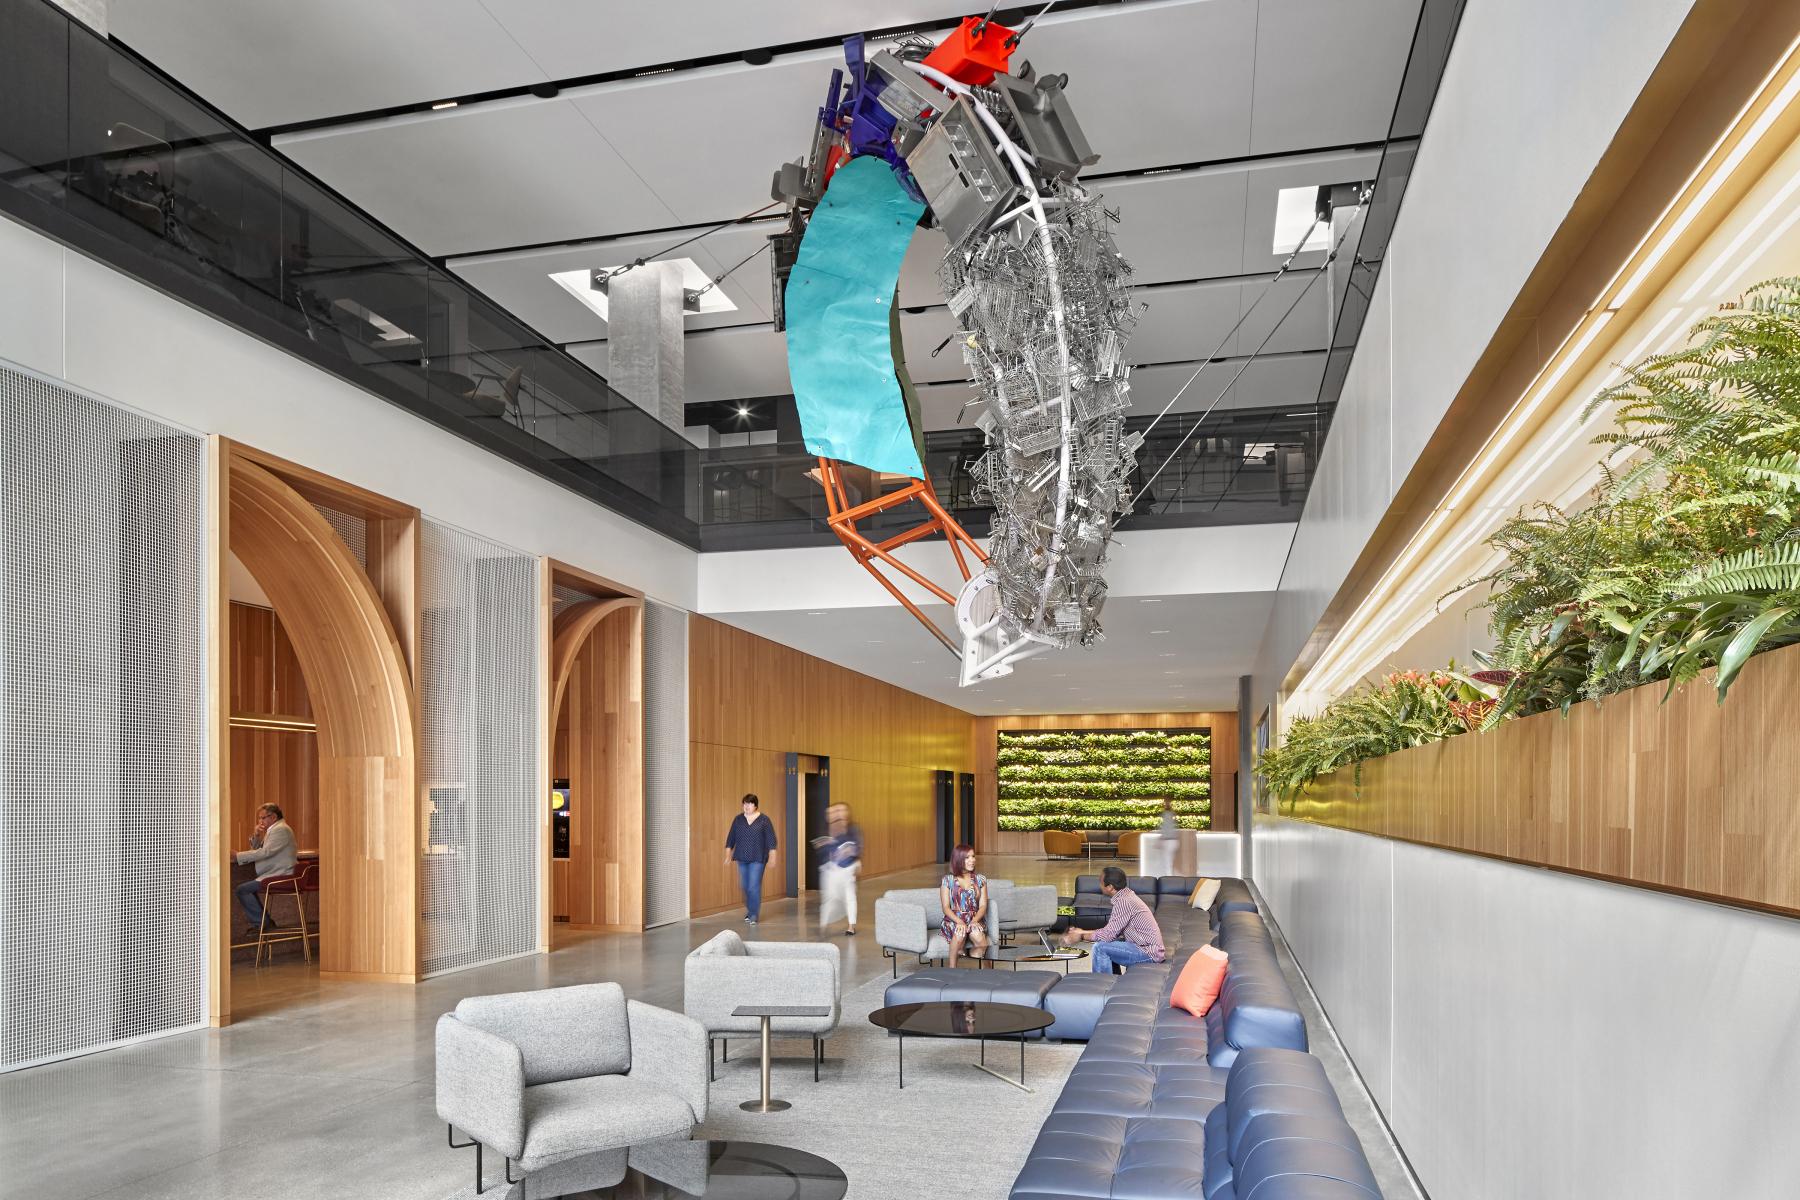 McDonald's Headquarters by Studio O+A and IA Interior Architects